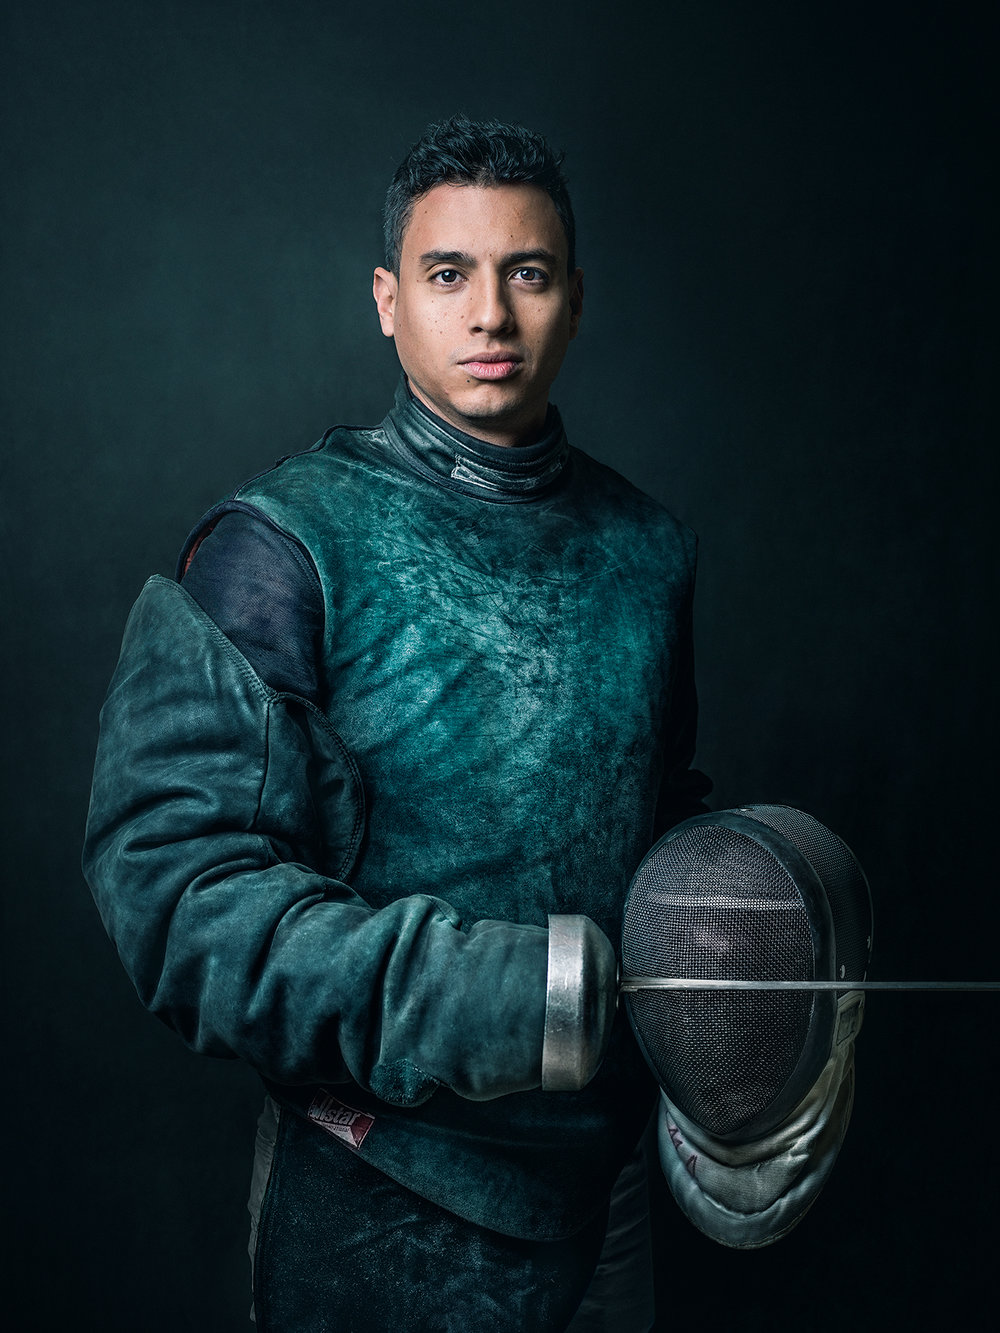 Alexander Gonzalez Silva